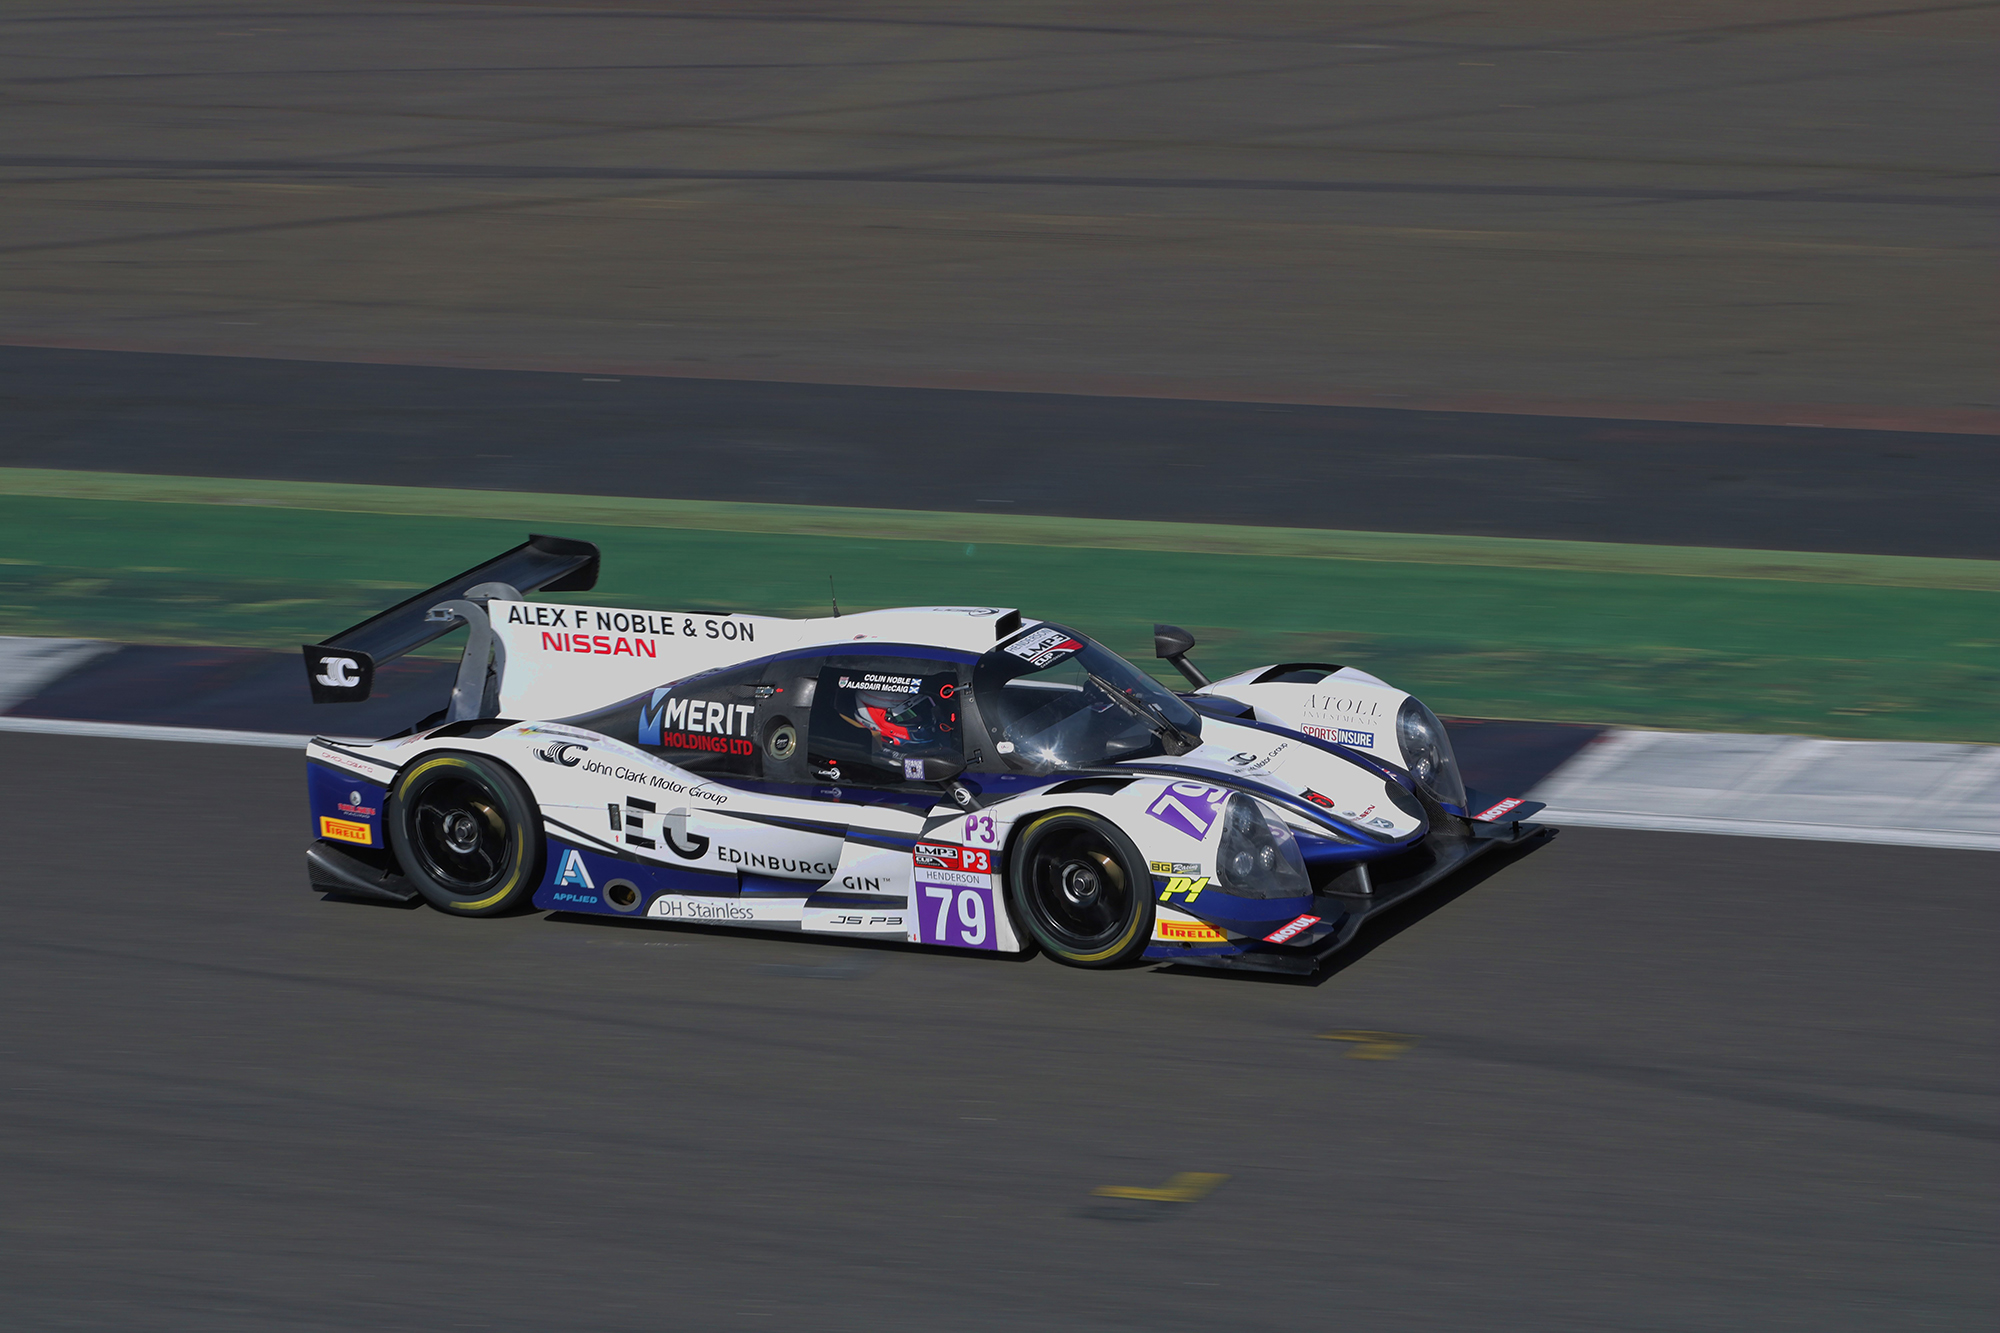 2017 LIGIER JS P3 OR03-75 - CHAMPIONSHIP WINNING RACECAR